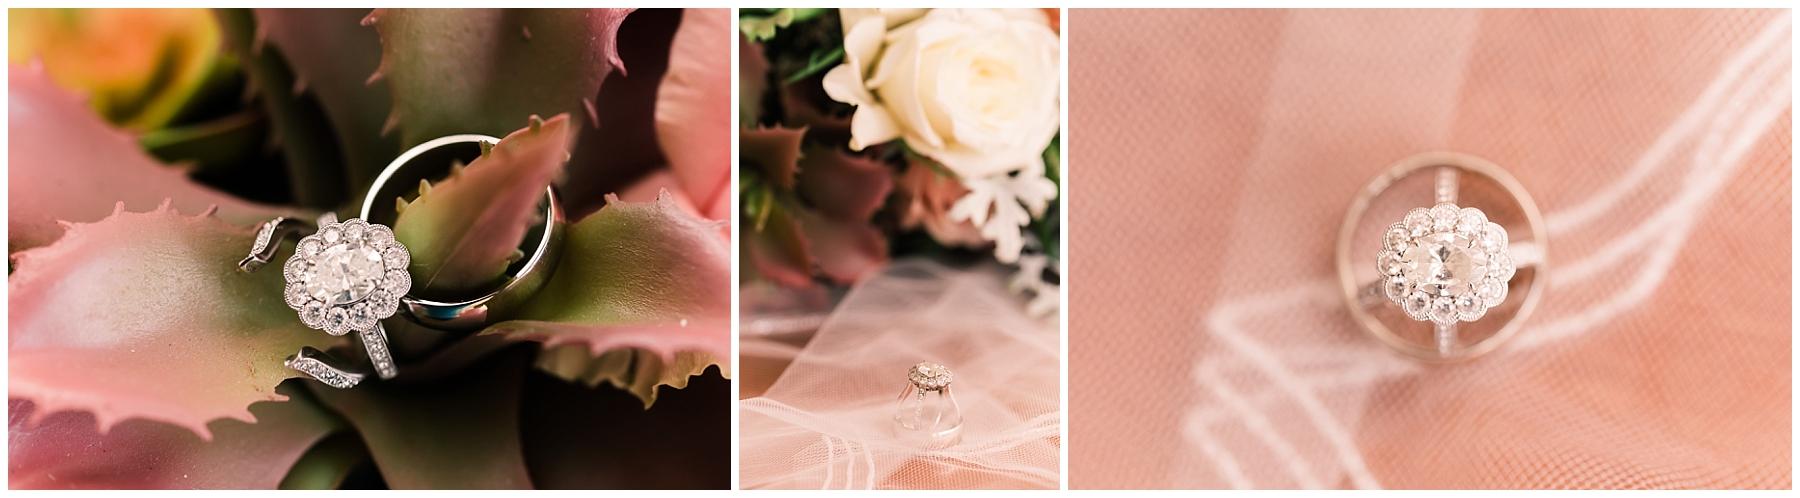 lafayette indiana wedding photography destination wedding fowler house mansion_0008.jpg